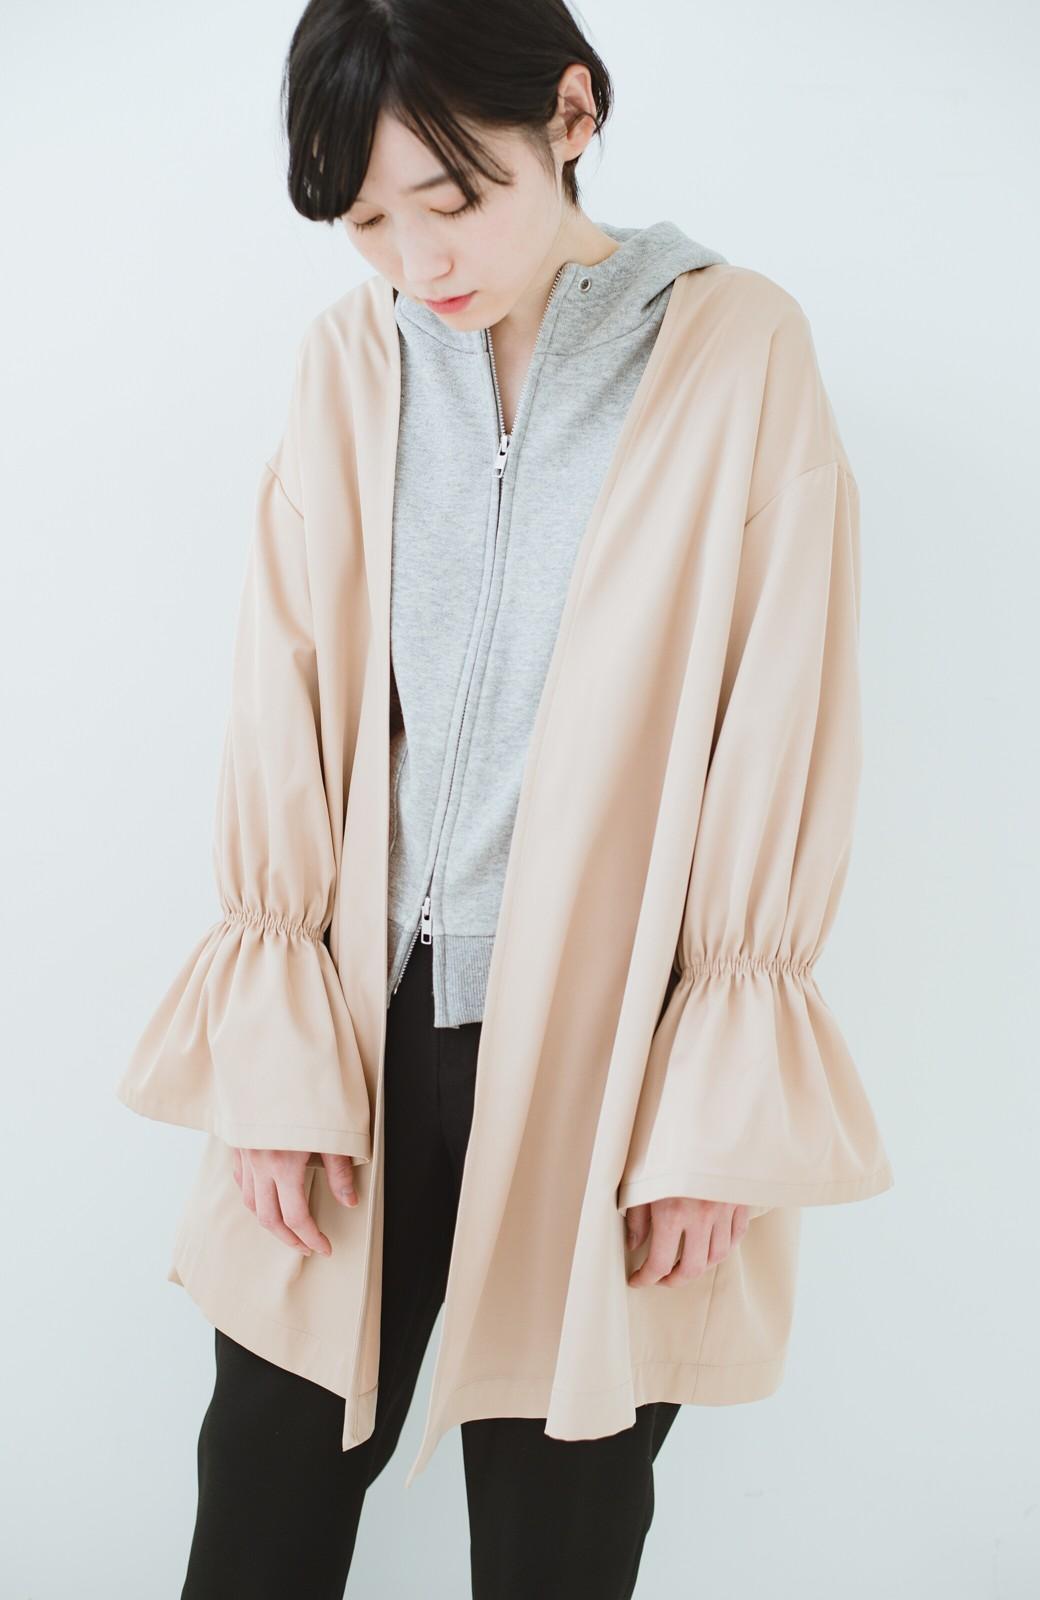 haco! ただ羽織るだけでオシャレに見える 気軽なフレアースリーブコート <ベージュ>の商品写真1